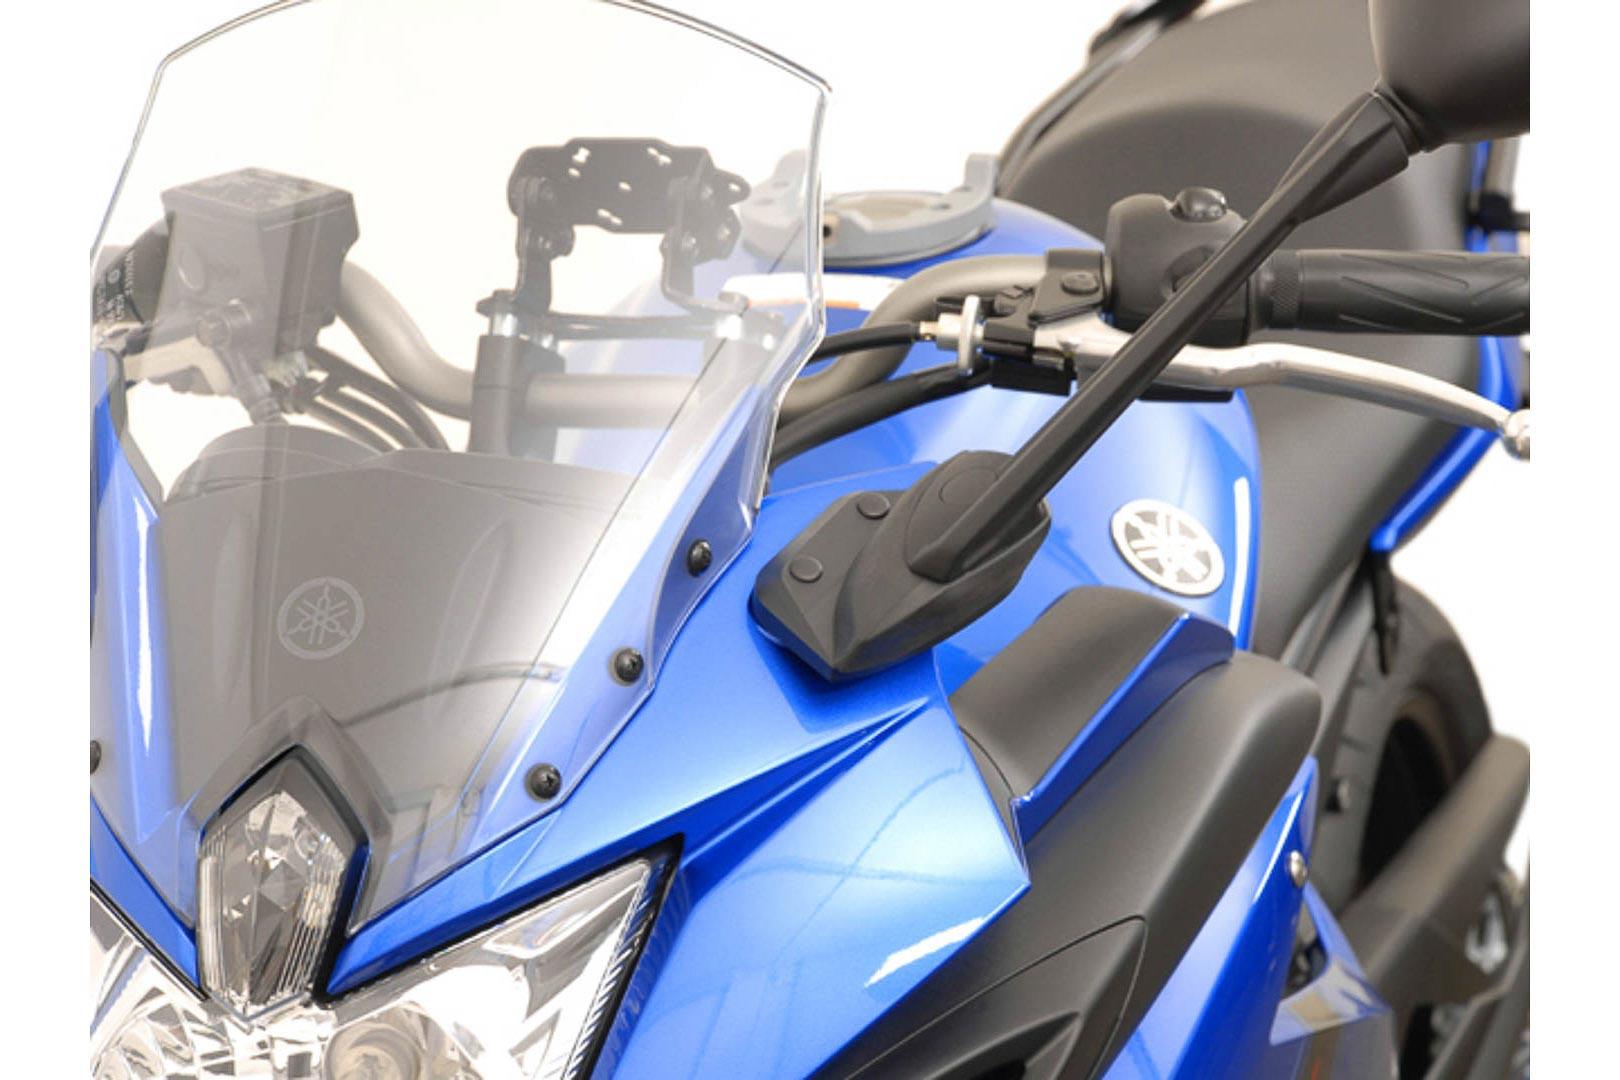 SW-Motech Peilinlevike Yamaha XJ-6 Diversion F 10-